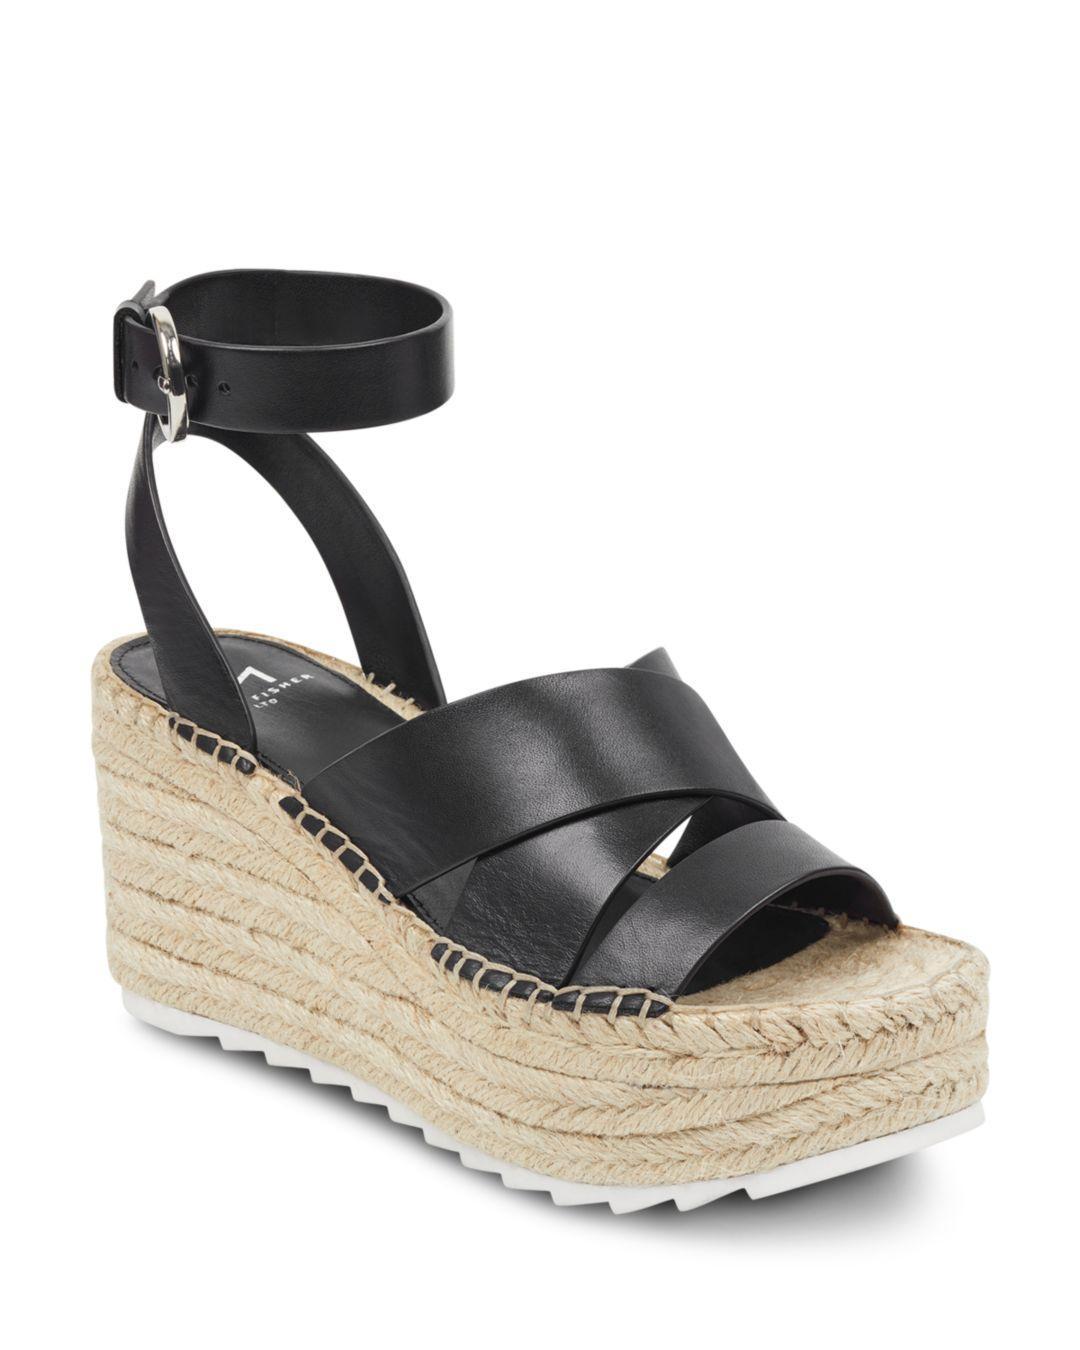 bae68c71971e Lyst - Marc Fisher Women s Raffa Espadrille Platform Wedge Sandals ...